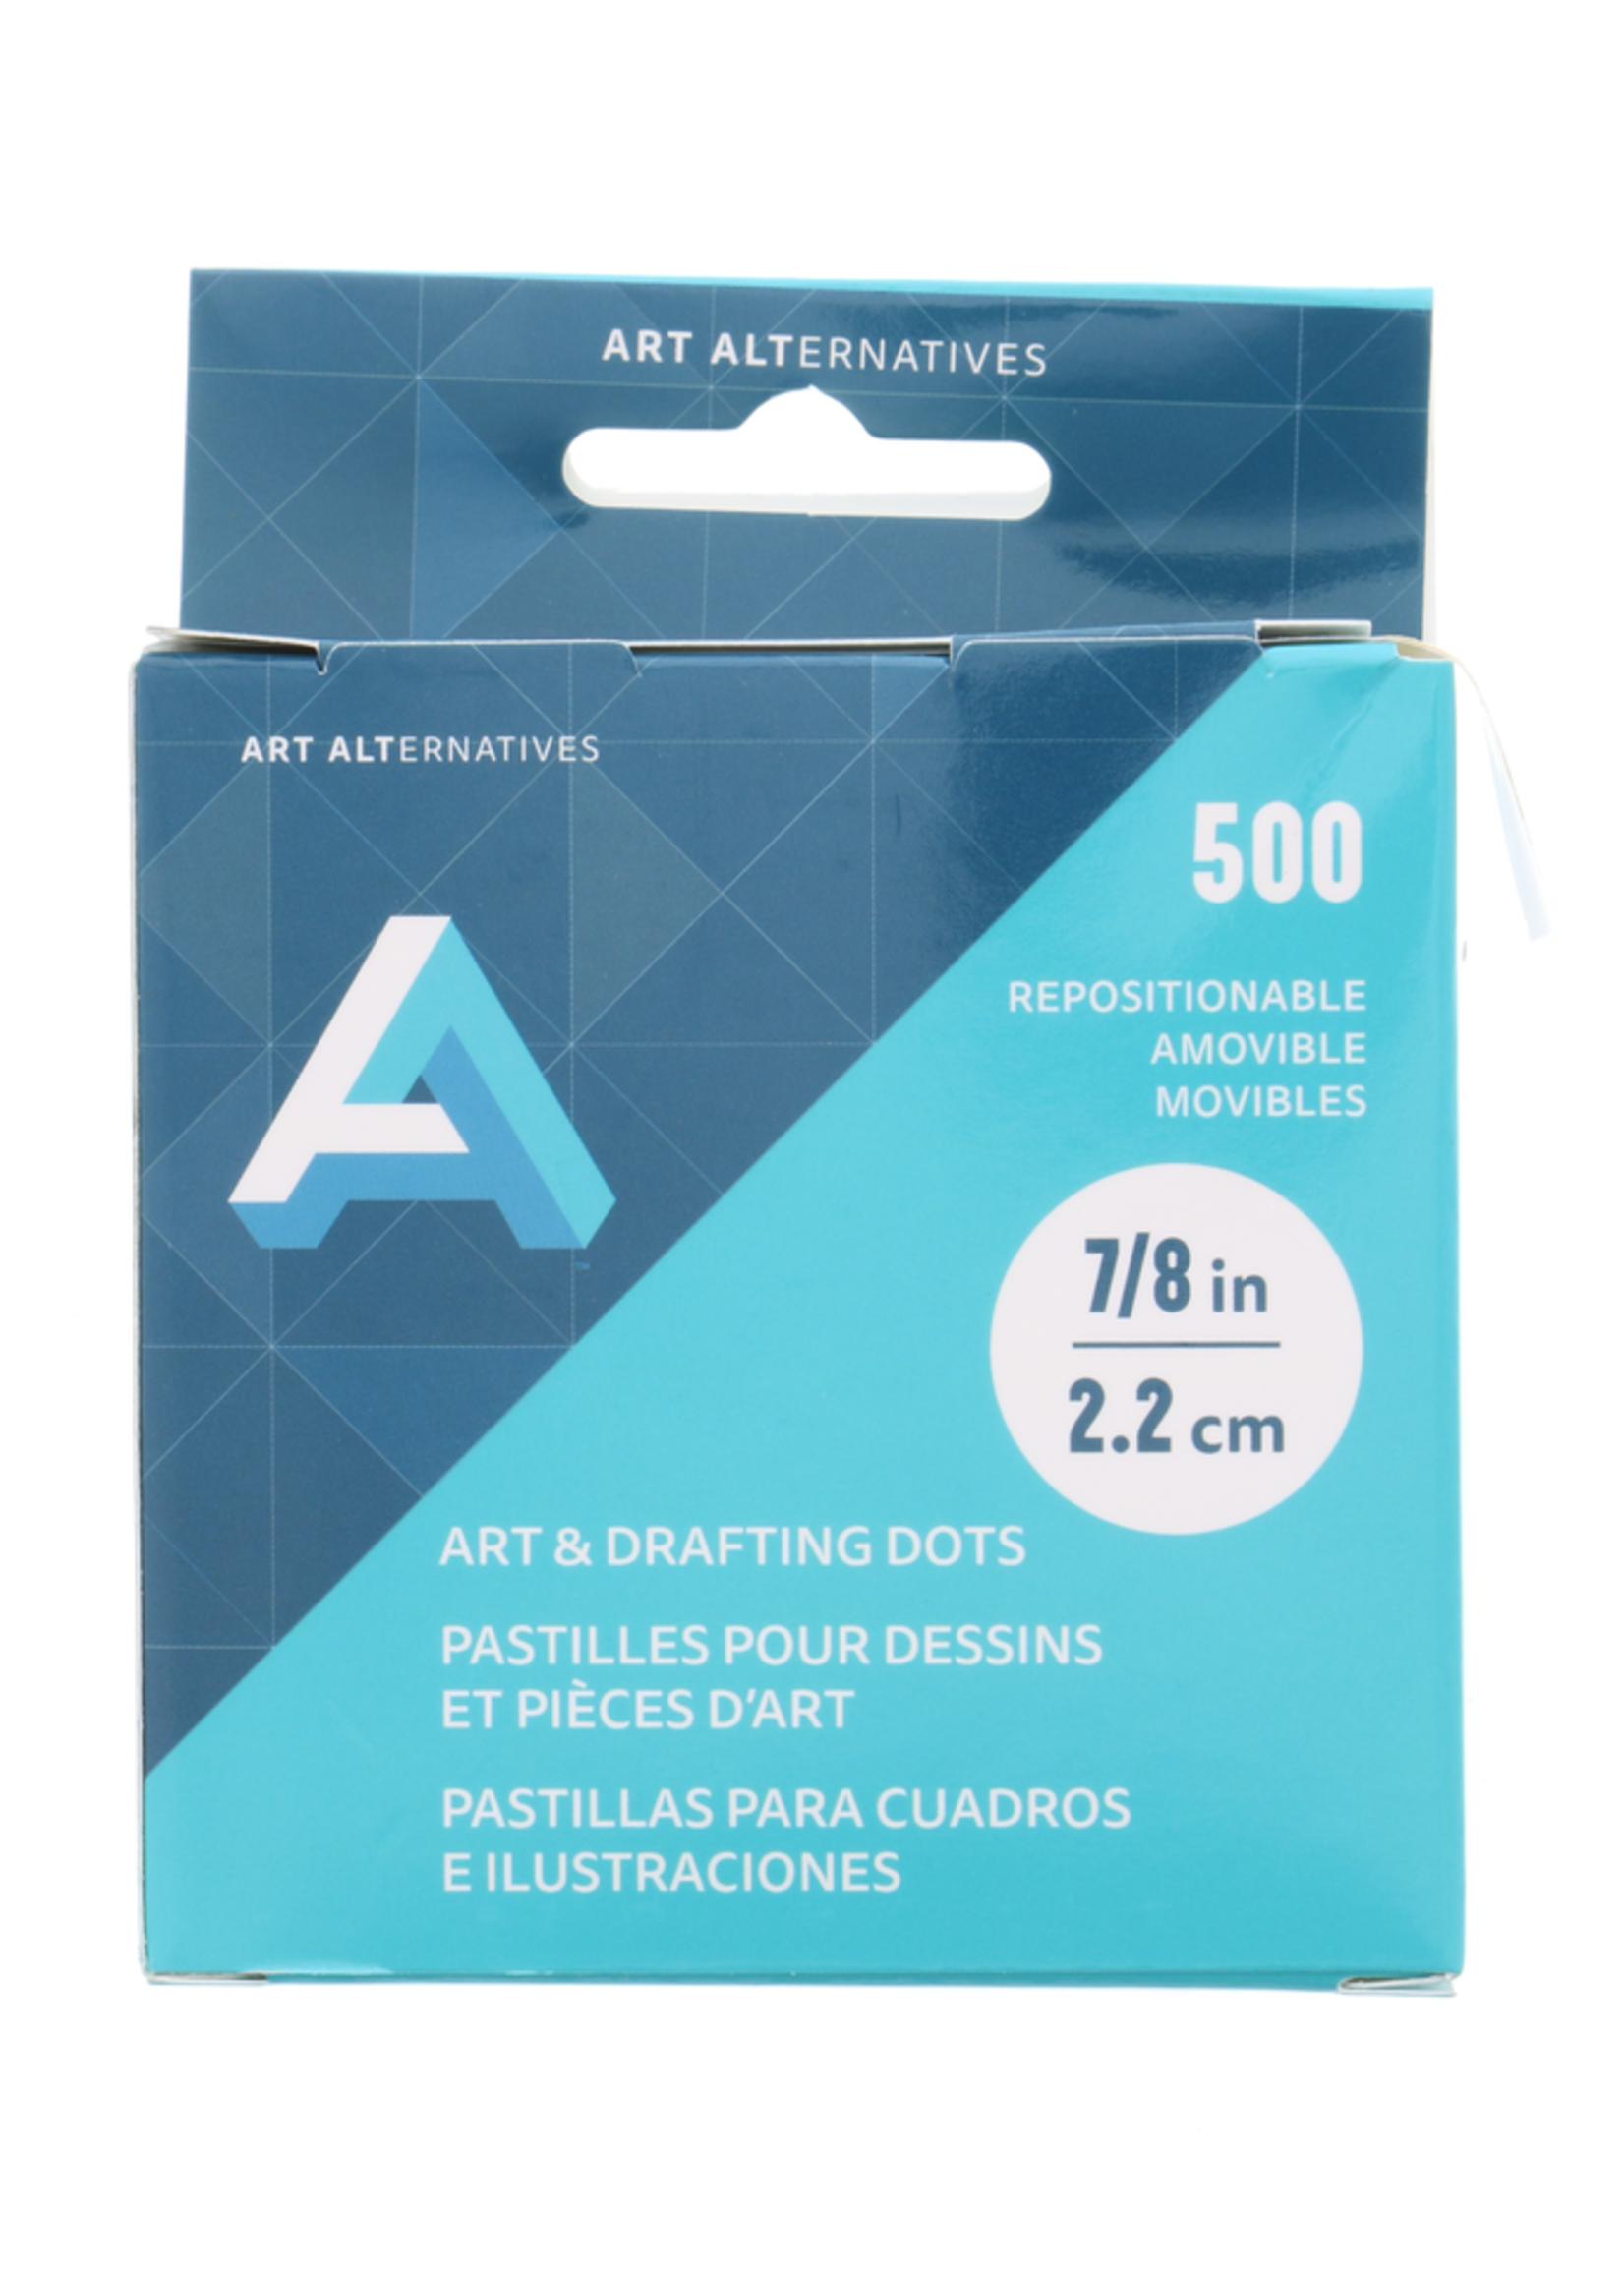 ART ALTERNATIVES AA DOTS- ART & DRAFTING 7/8 IN